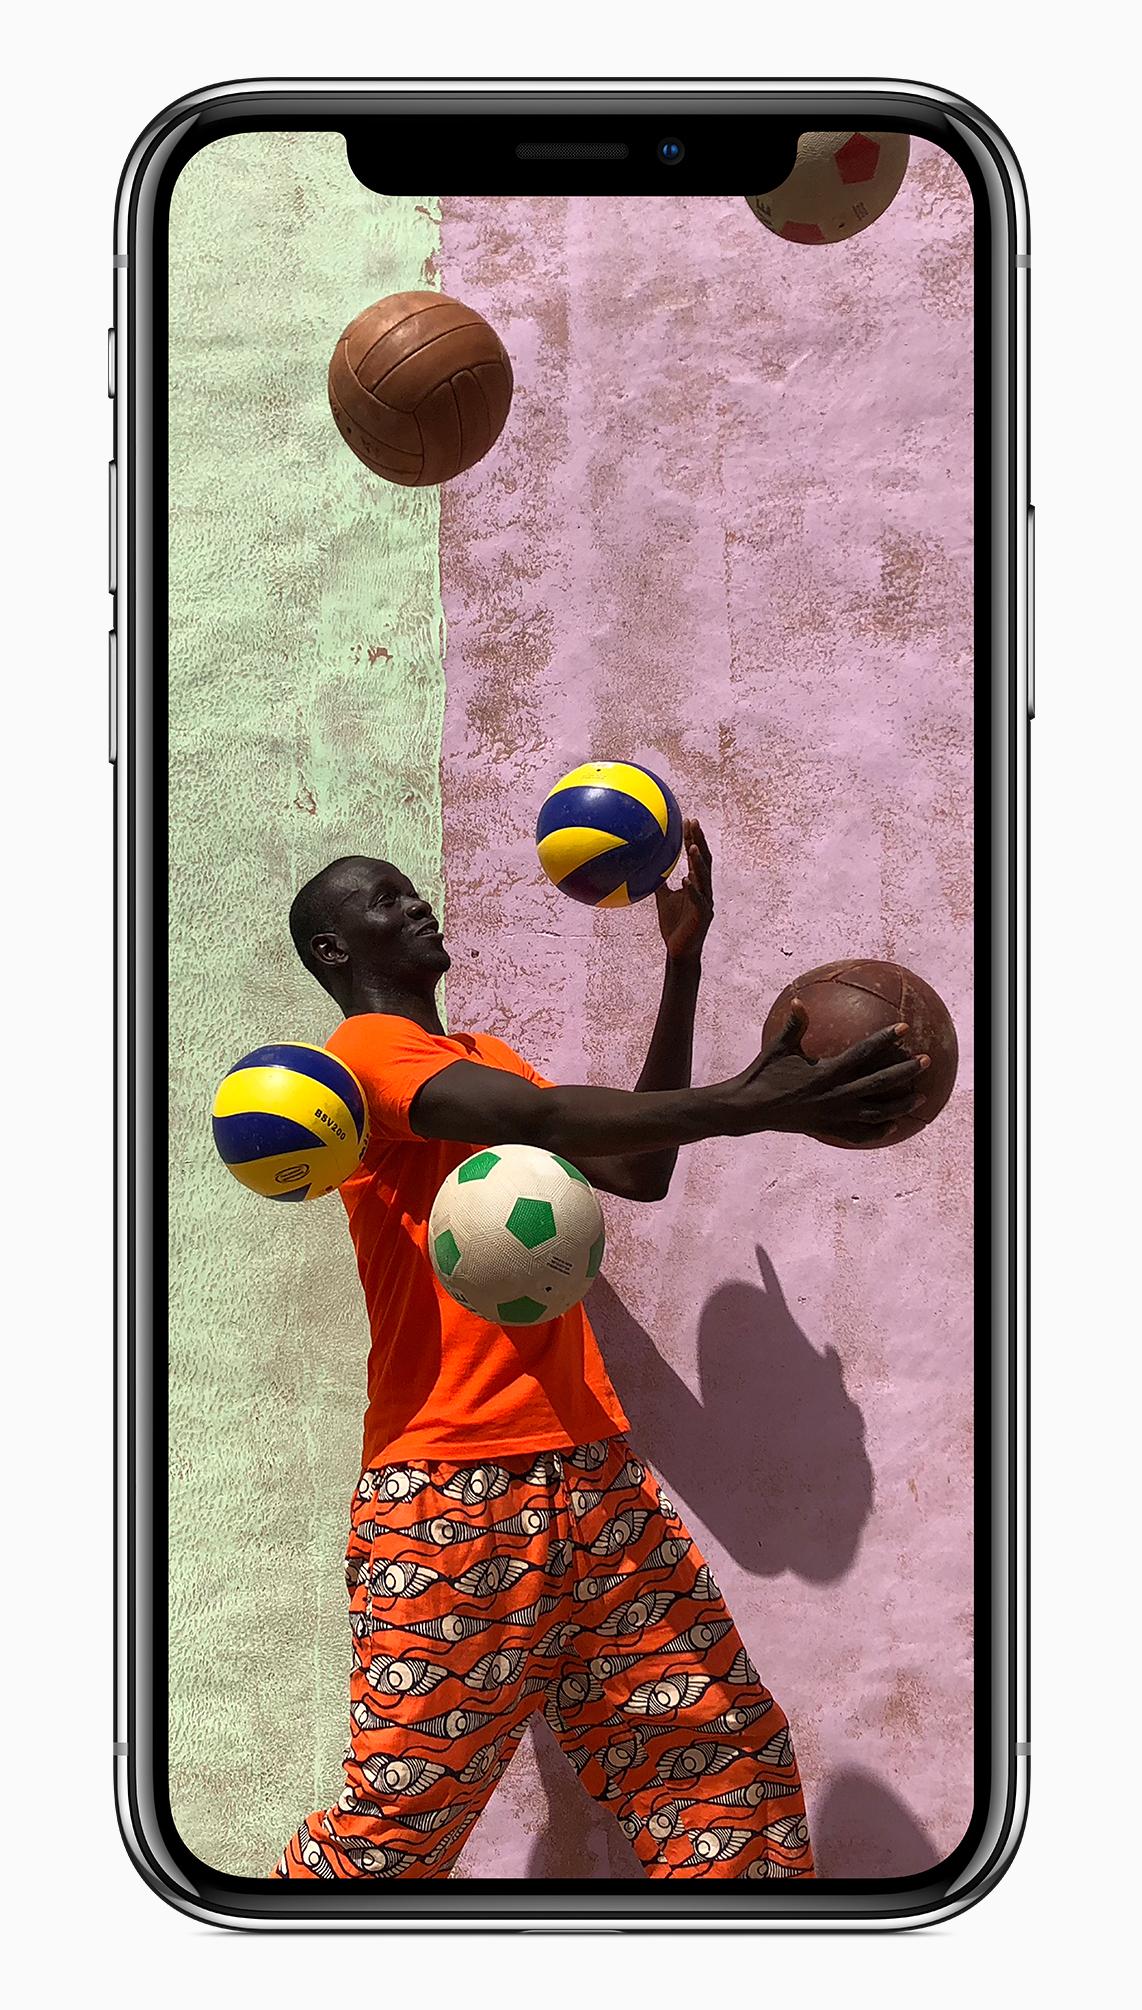 iphonex-front-vibrant-camera.jpg